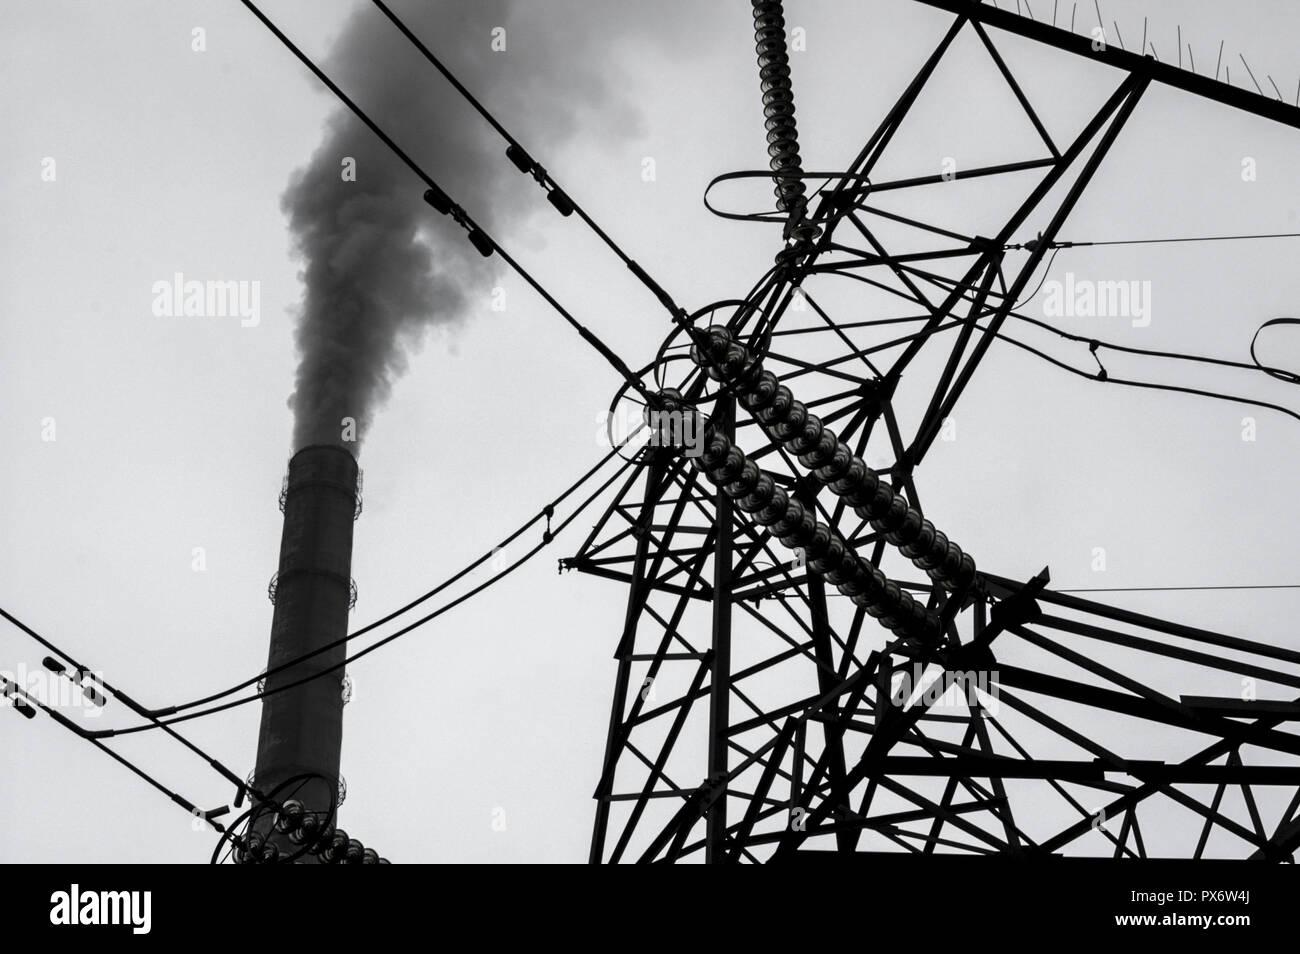 Smoke Stacks High Tension Poles Ukraine Western Ukraine Stock